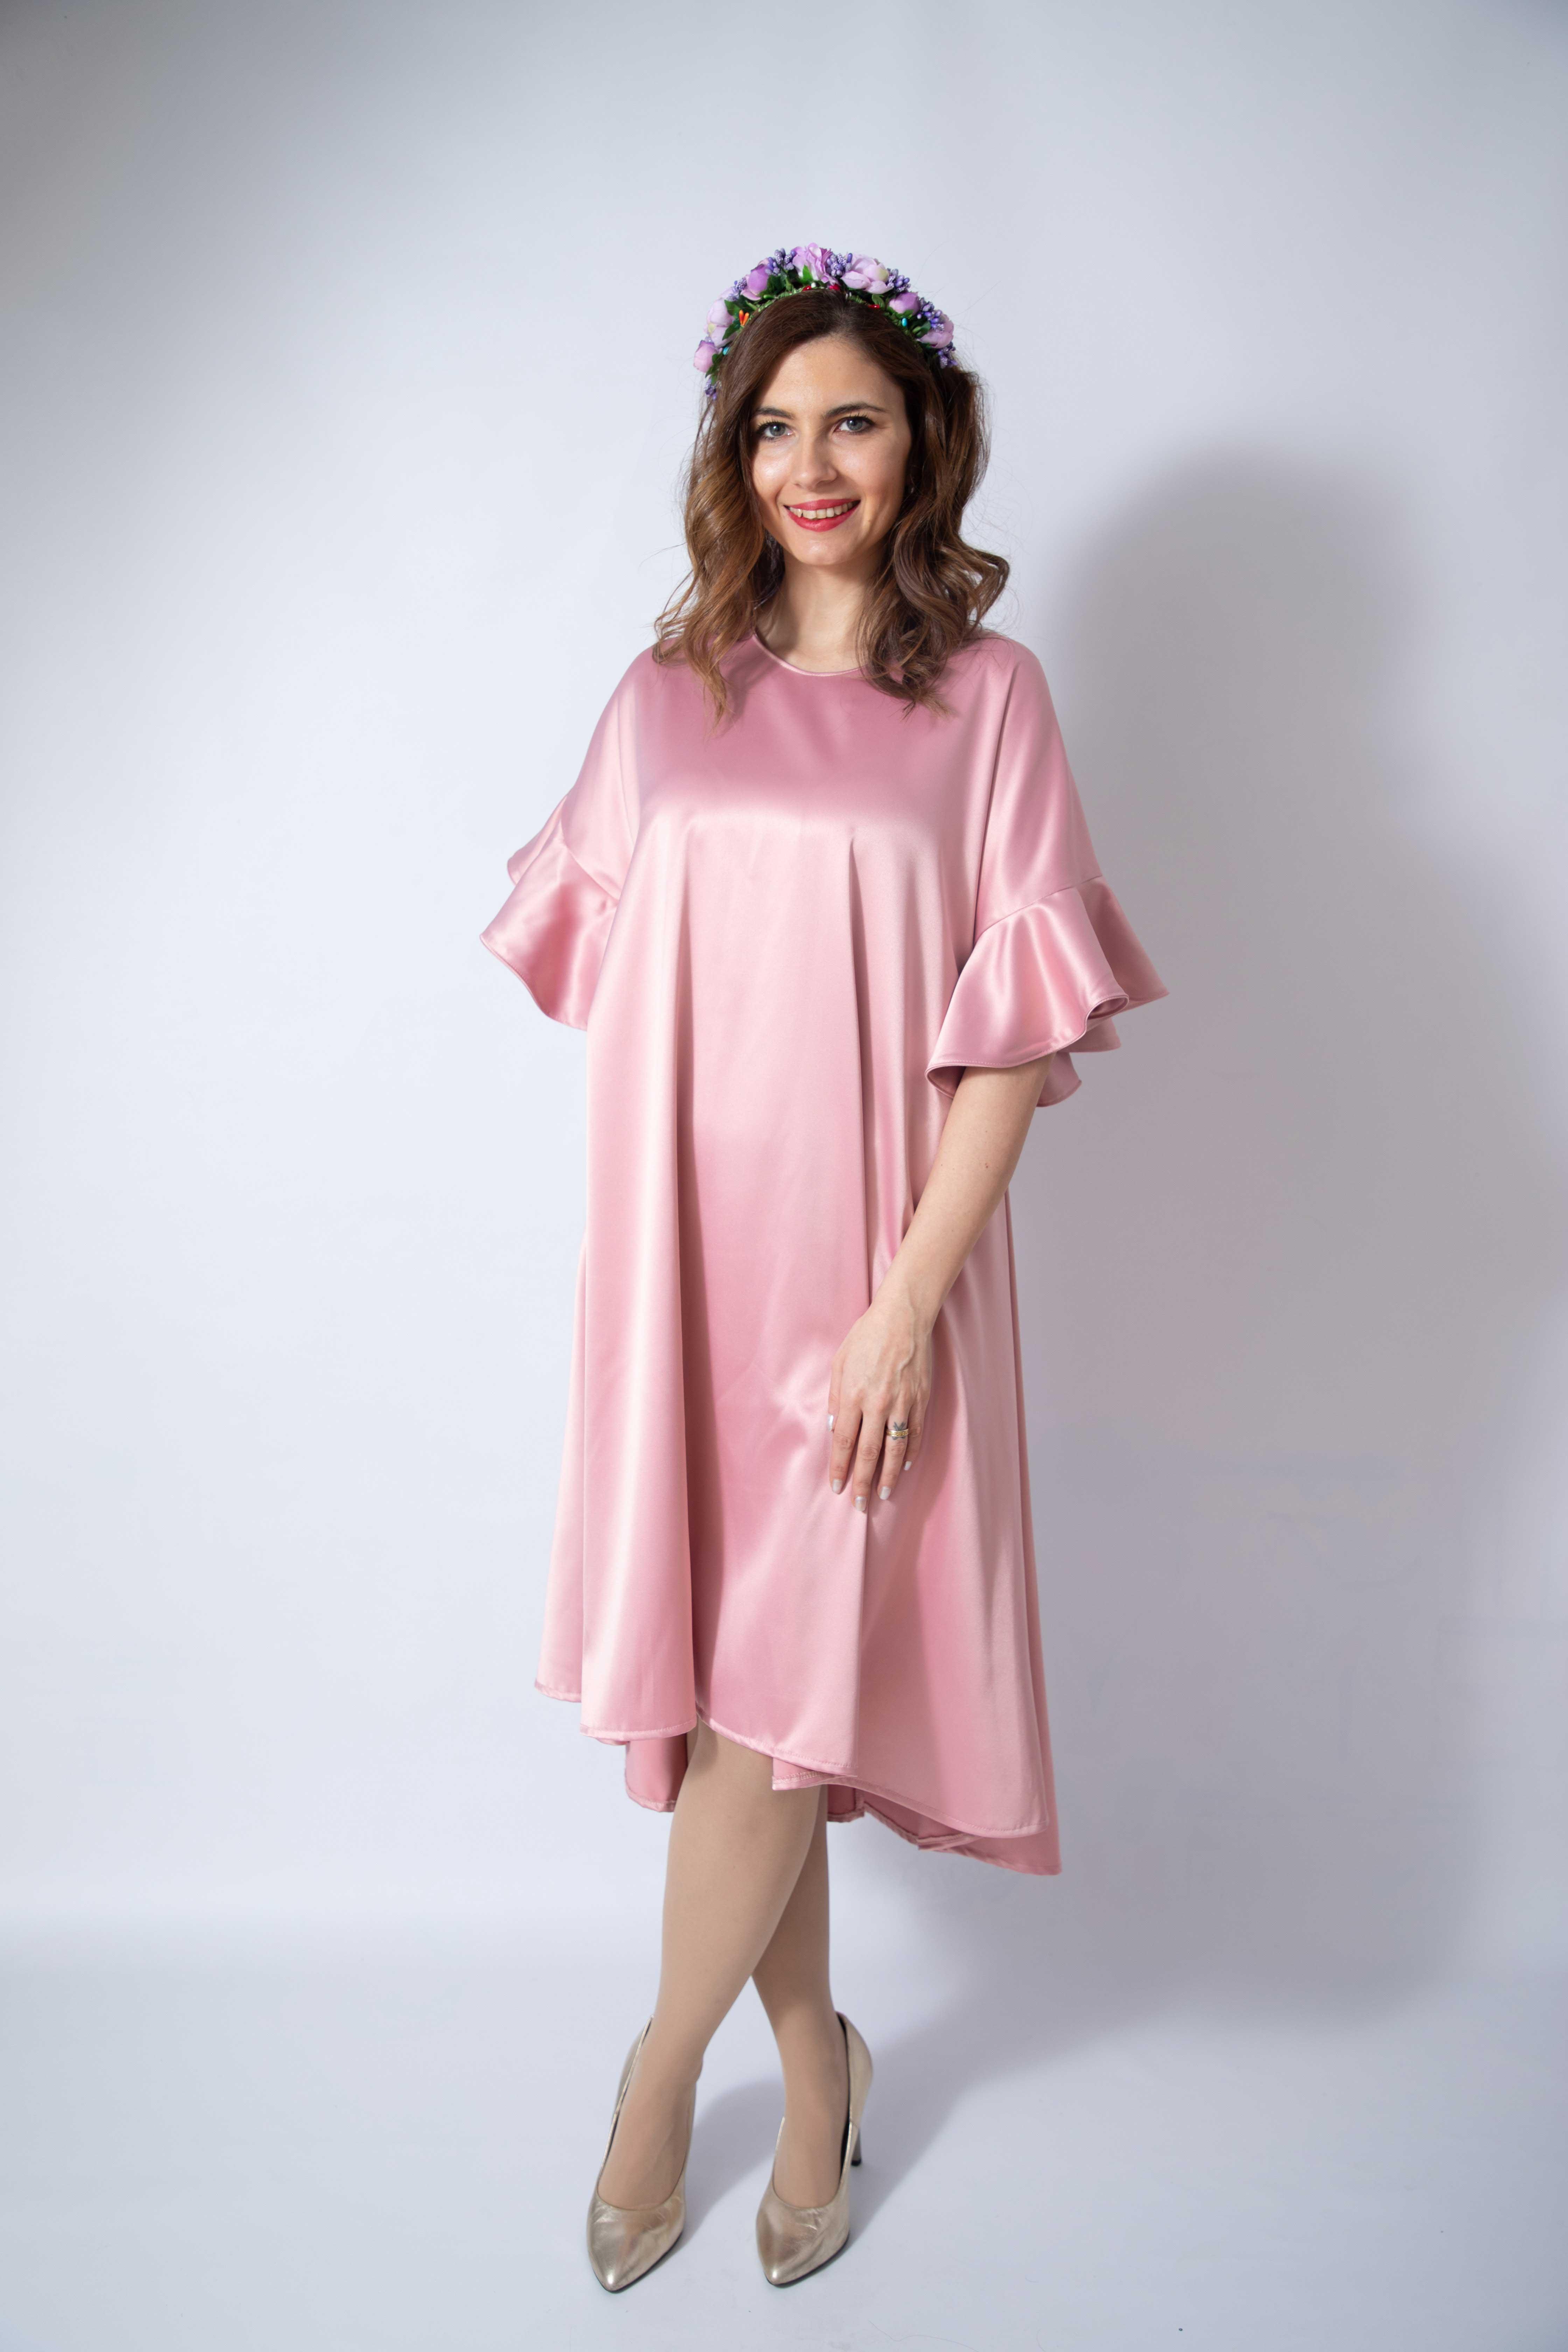 champagne-blush-rochie-super-eleganta-gravida-produsa-in-romania 4